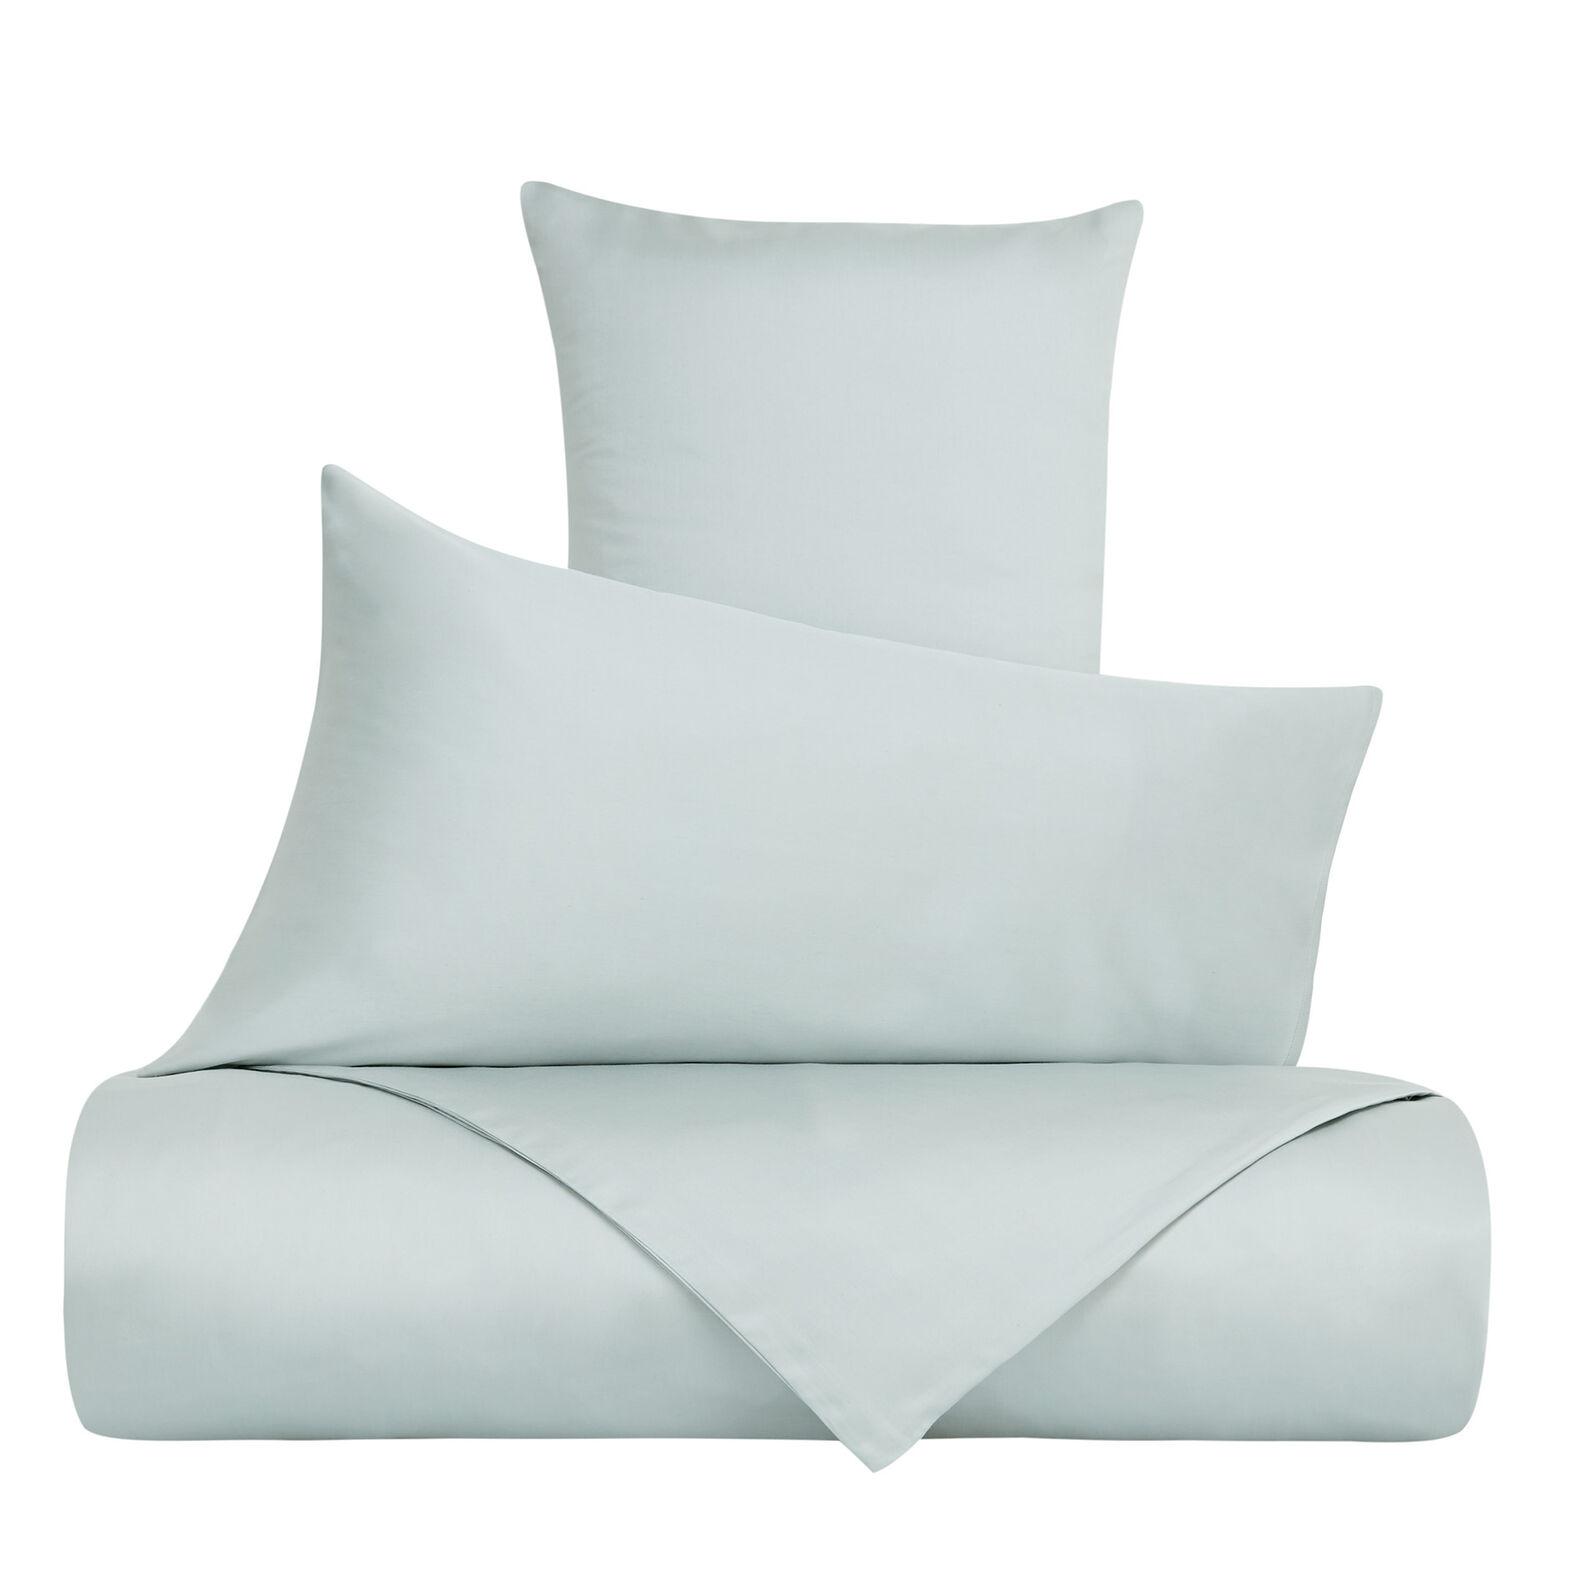 Solid colour pillowcase in Tencel satin